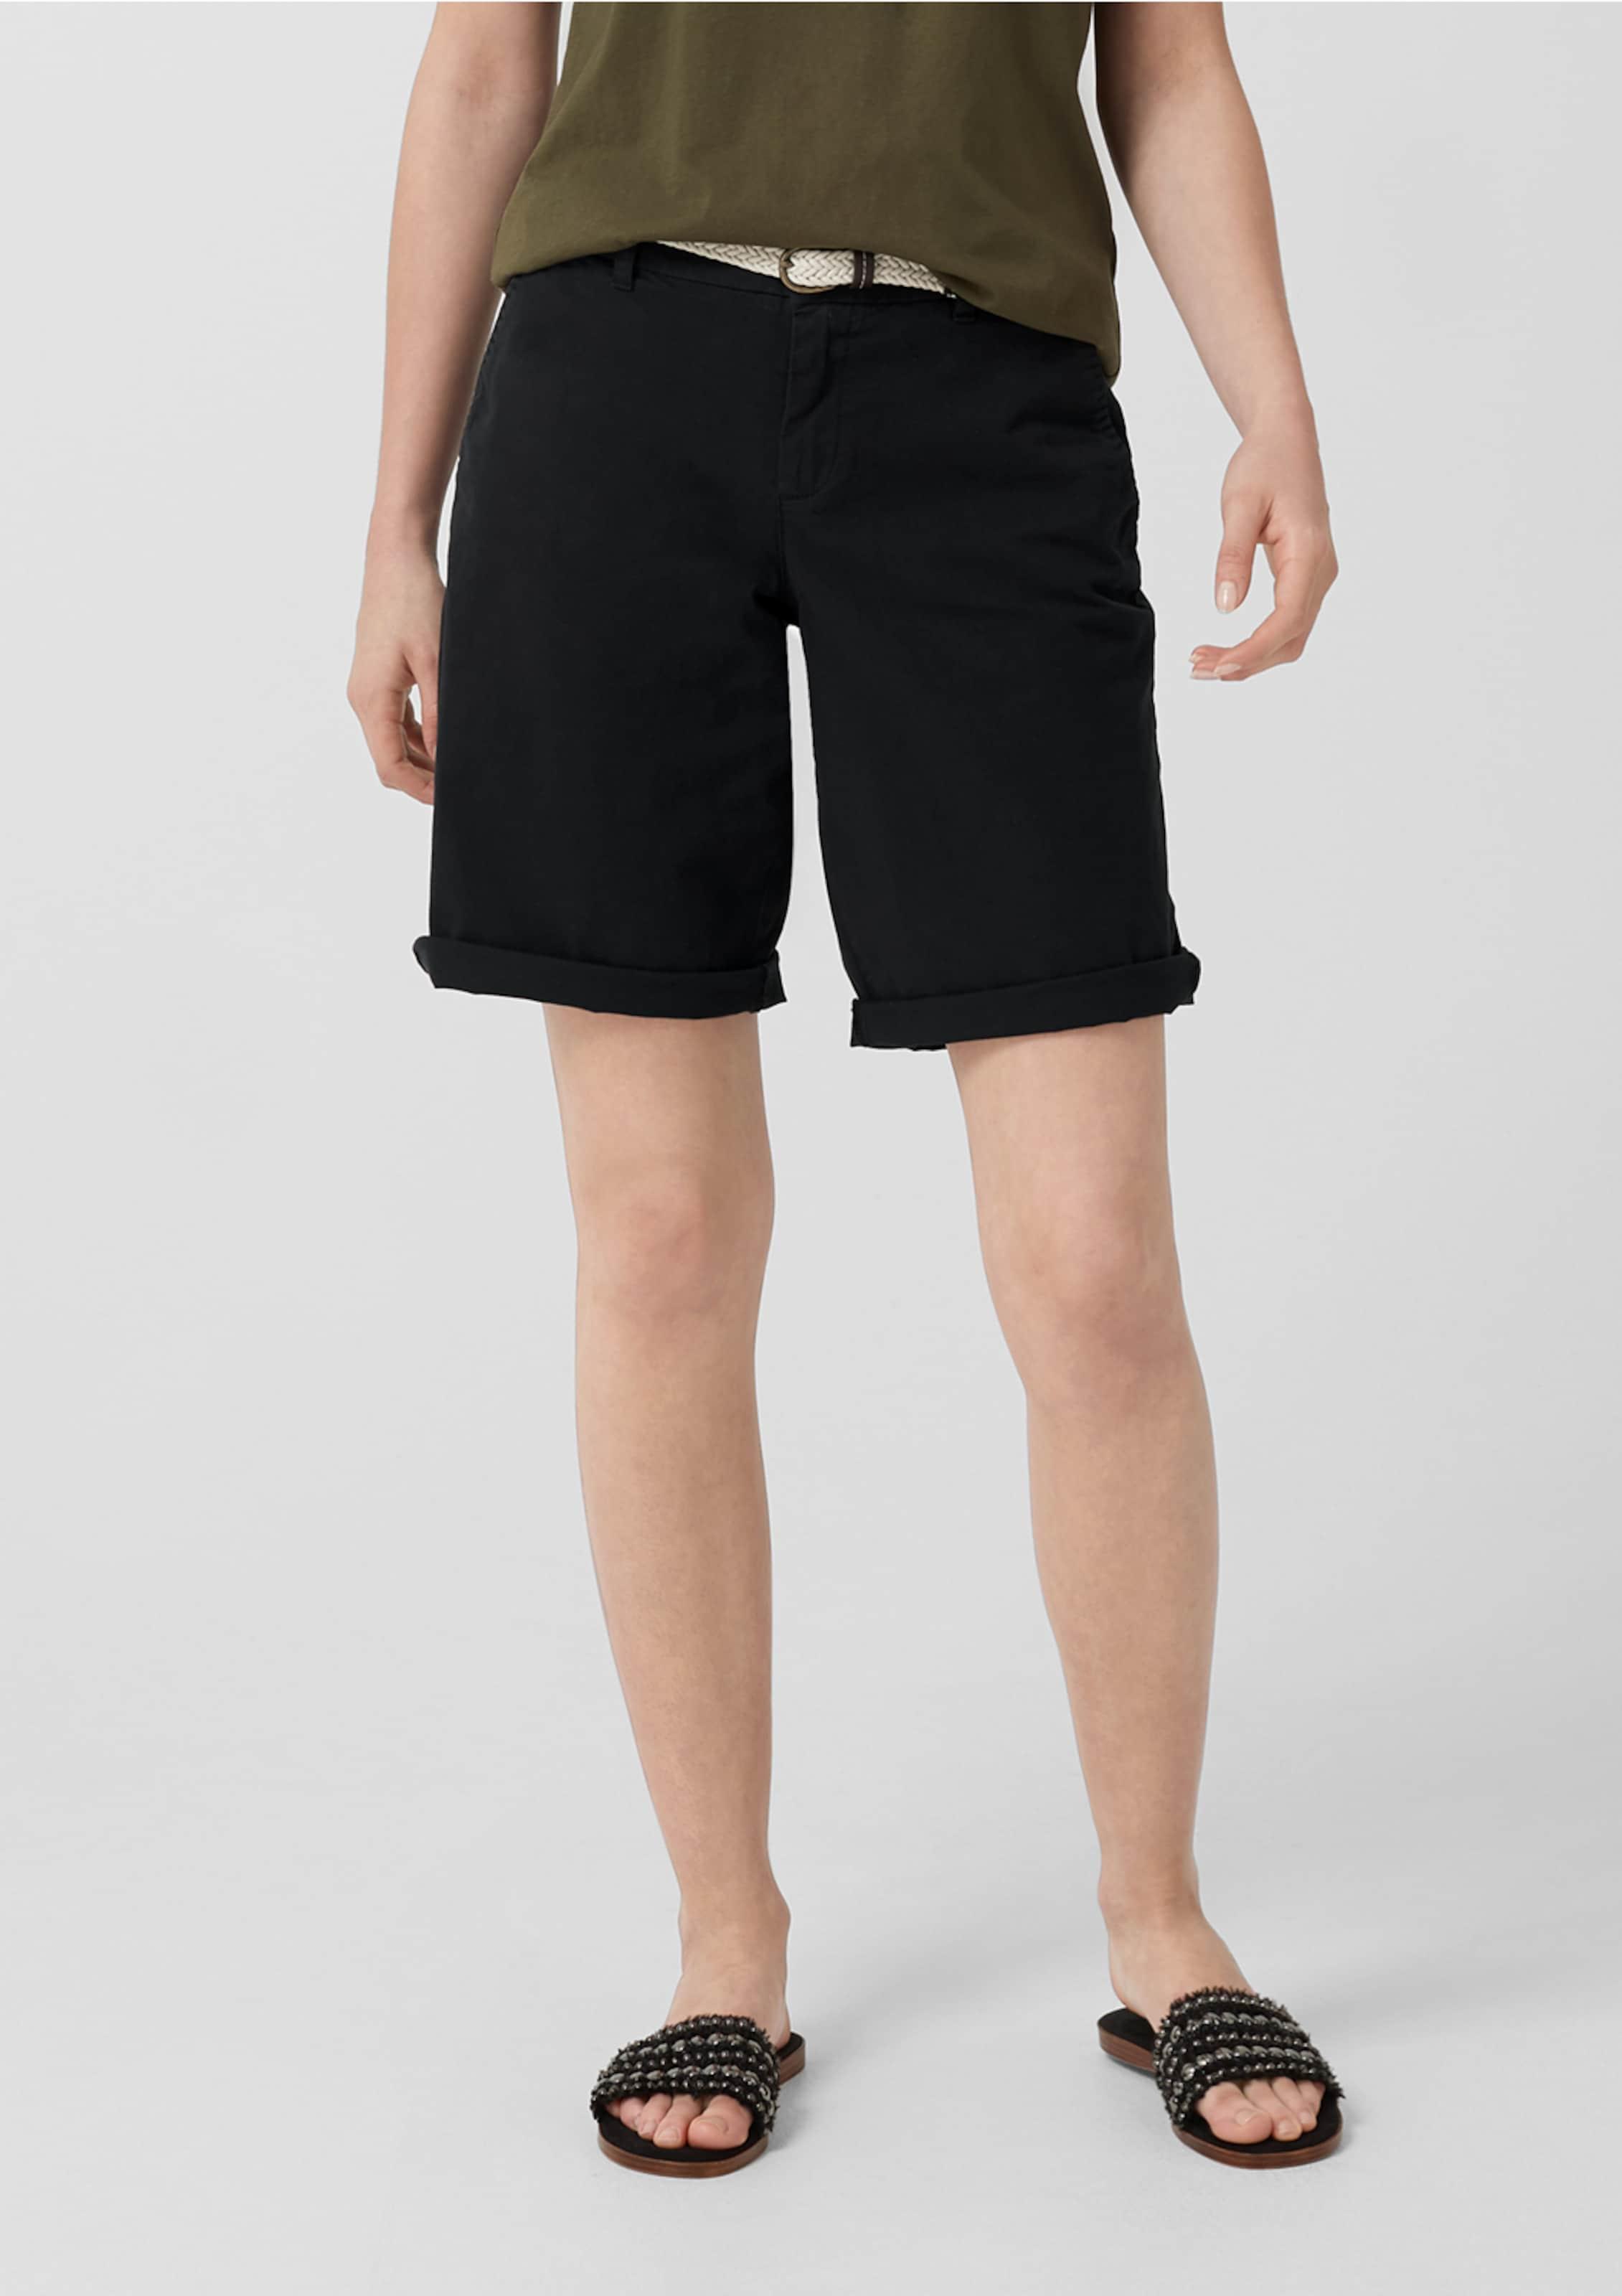 S Red Label Shorts oliver Schwarz In OiuZlwPkXT